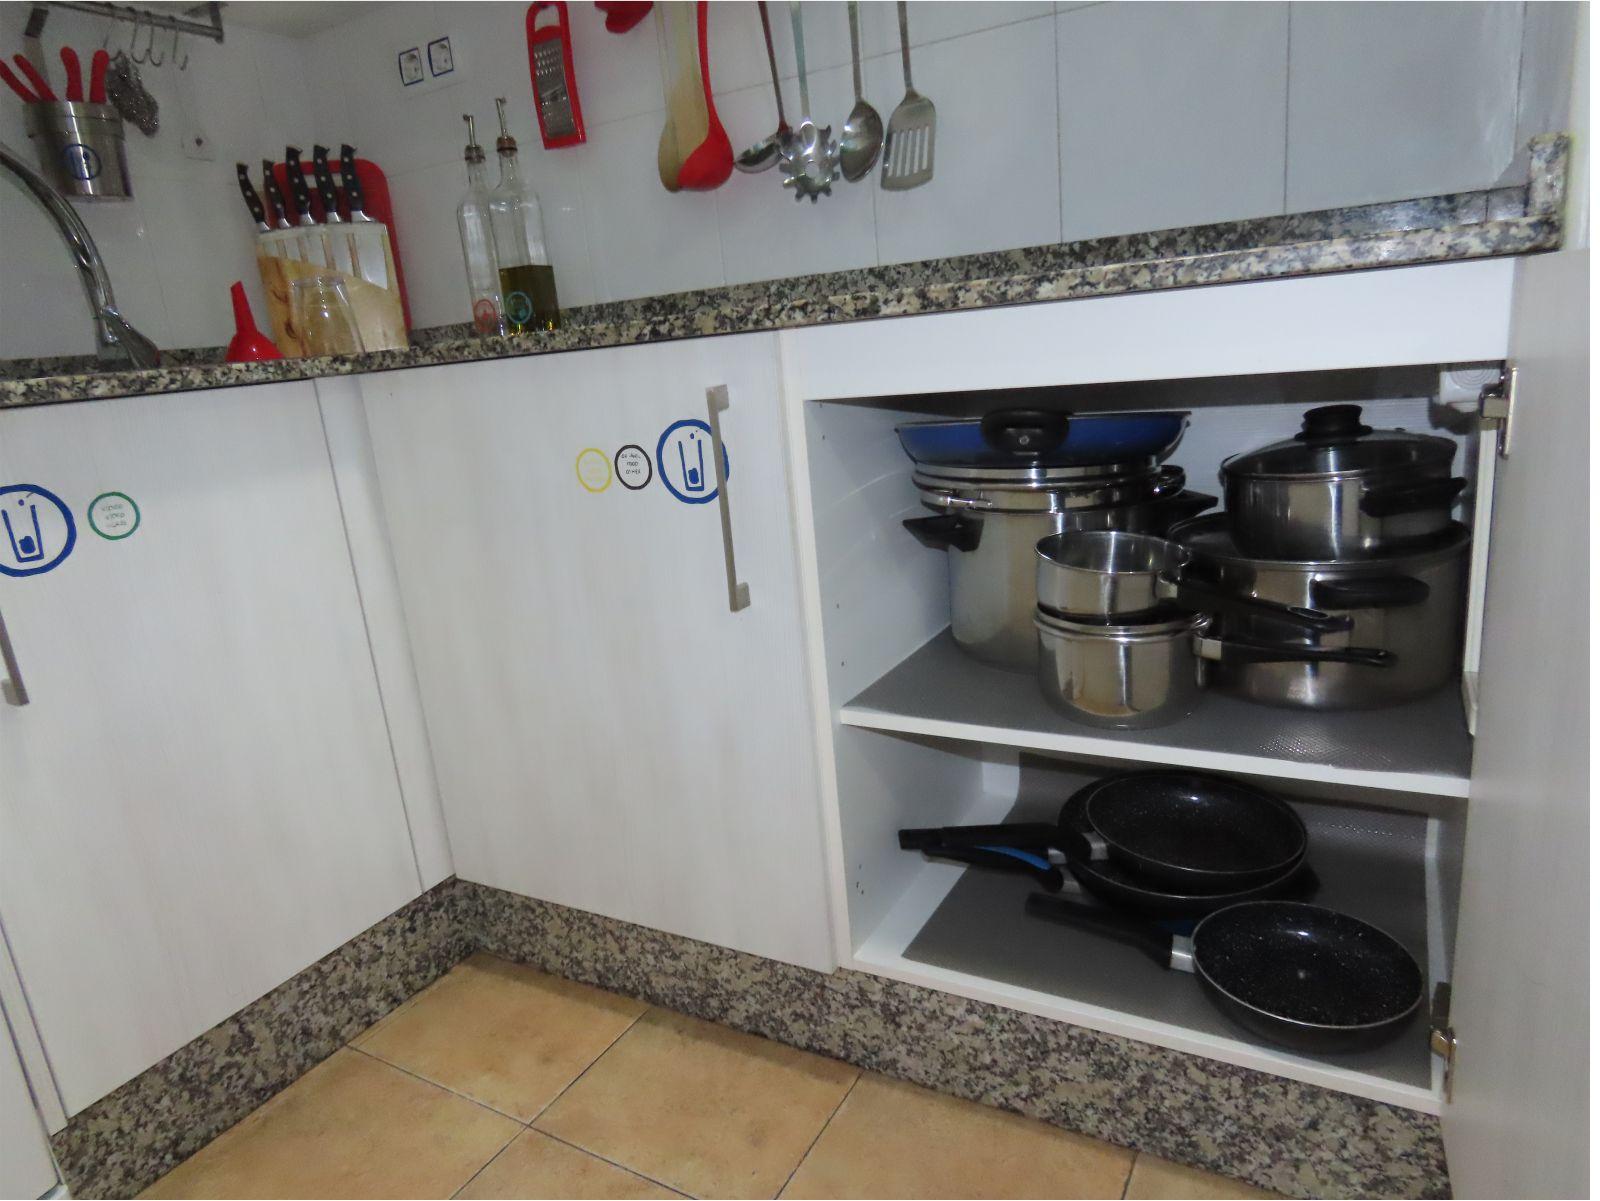 Menaje en la cocina - Kitchenware in the kitchen